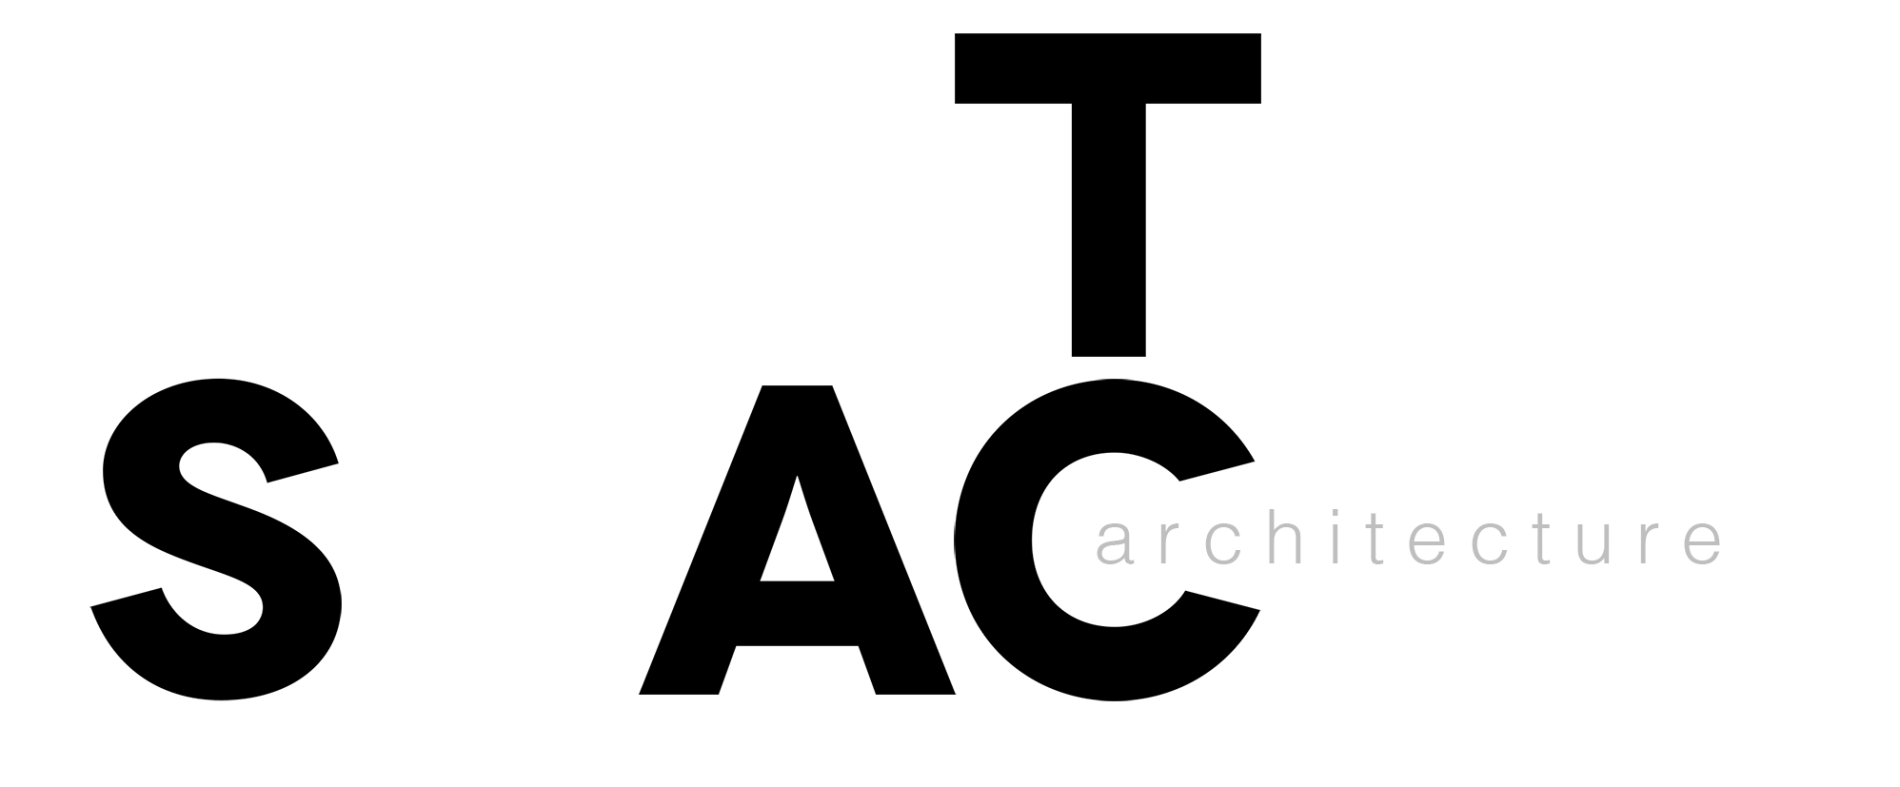 stac-logo-animation-02-1900x787.png